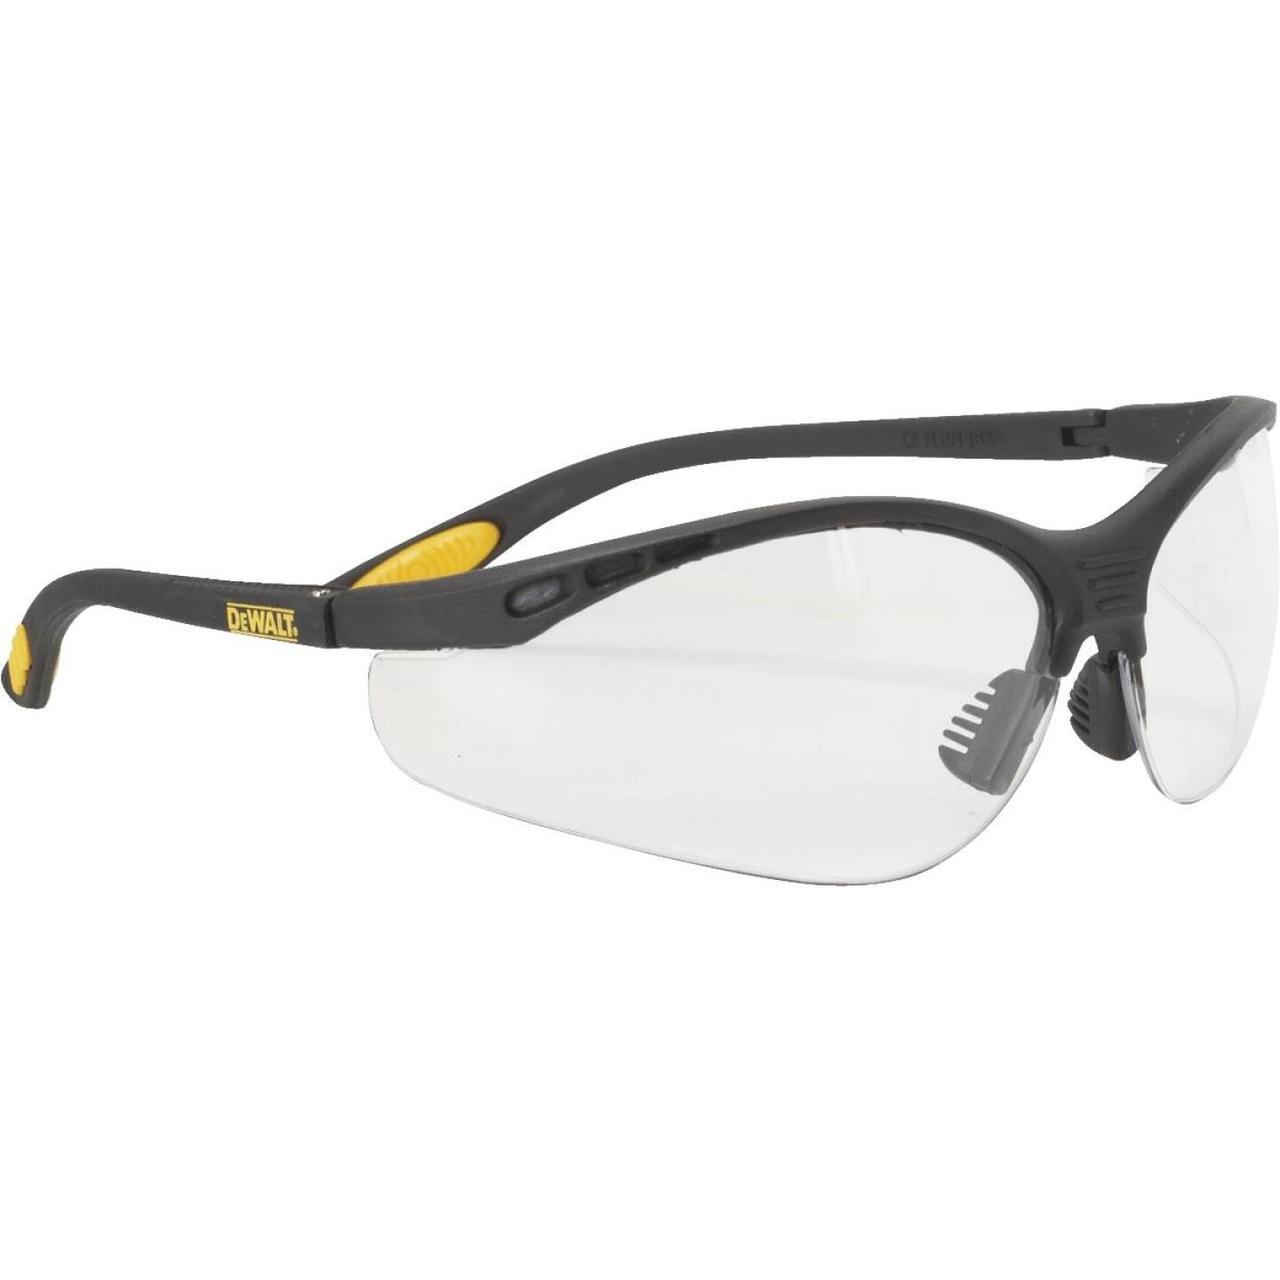 Dewalt Reinforcer Black/Yellow Frame Safety Glasses With Clear Lenses